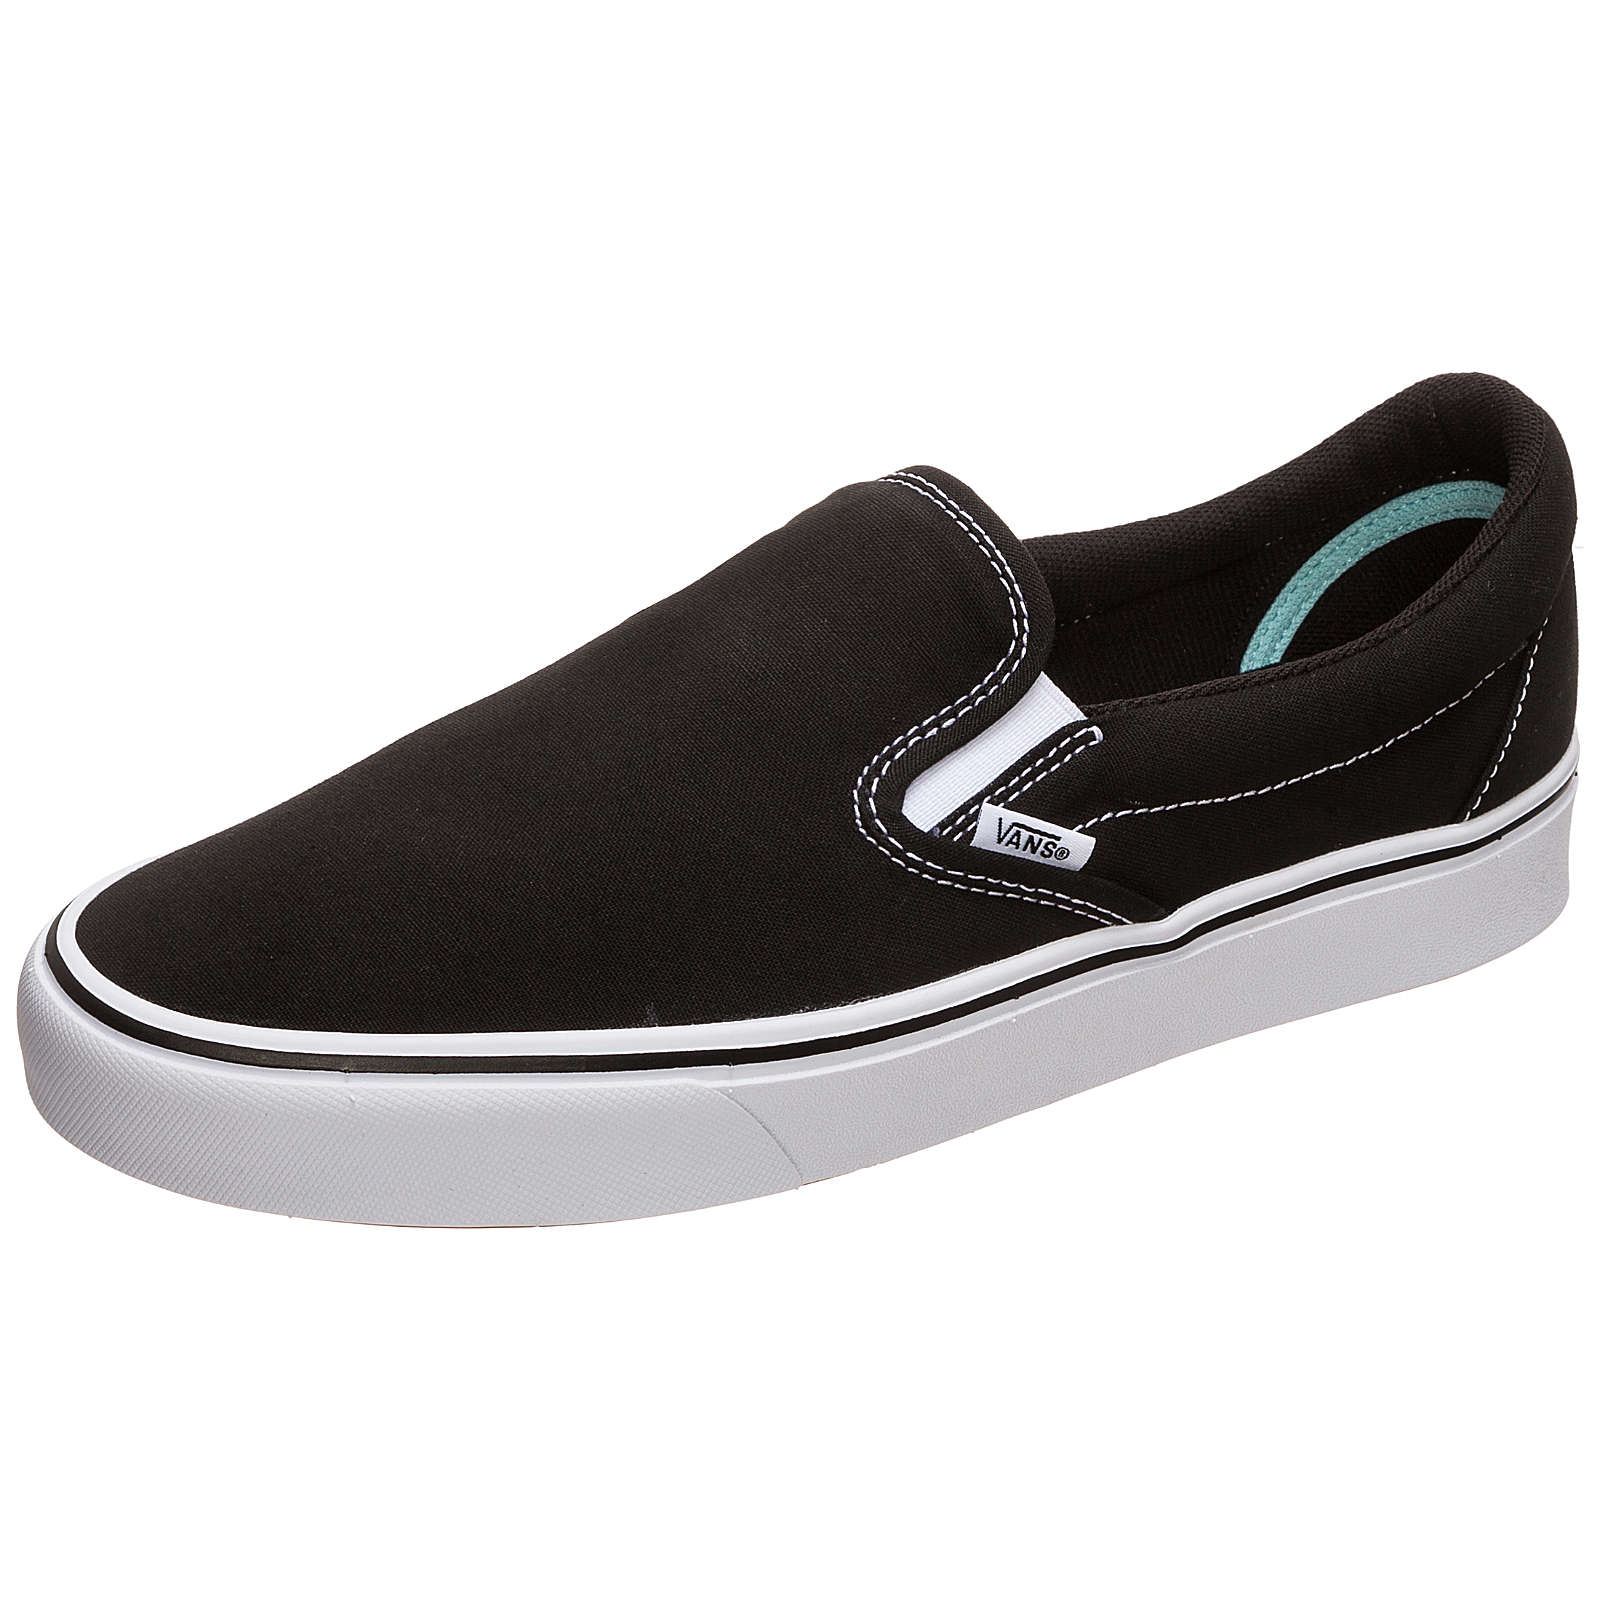 VANS Slip-On ComfyCush Sneaker Damen schwarz/weiß Gr. 44,5